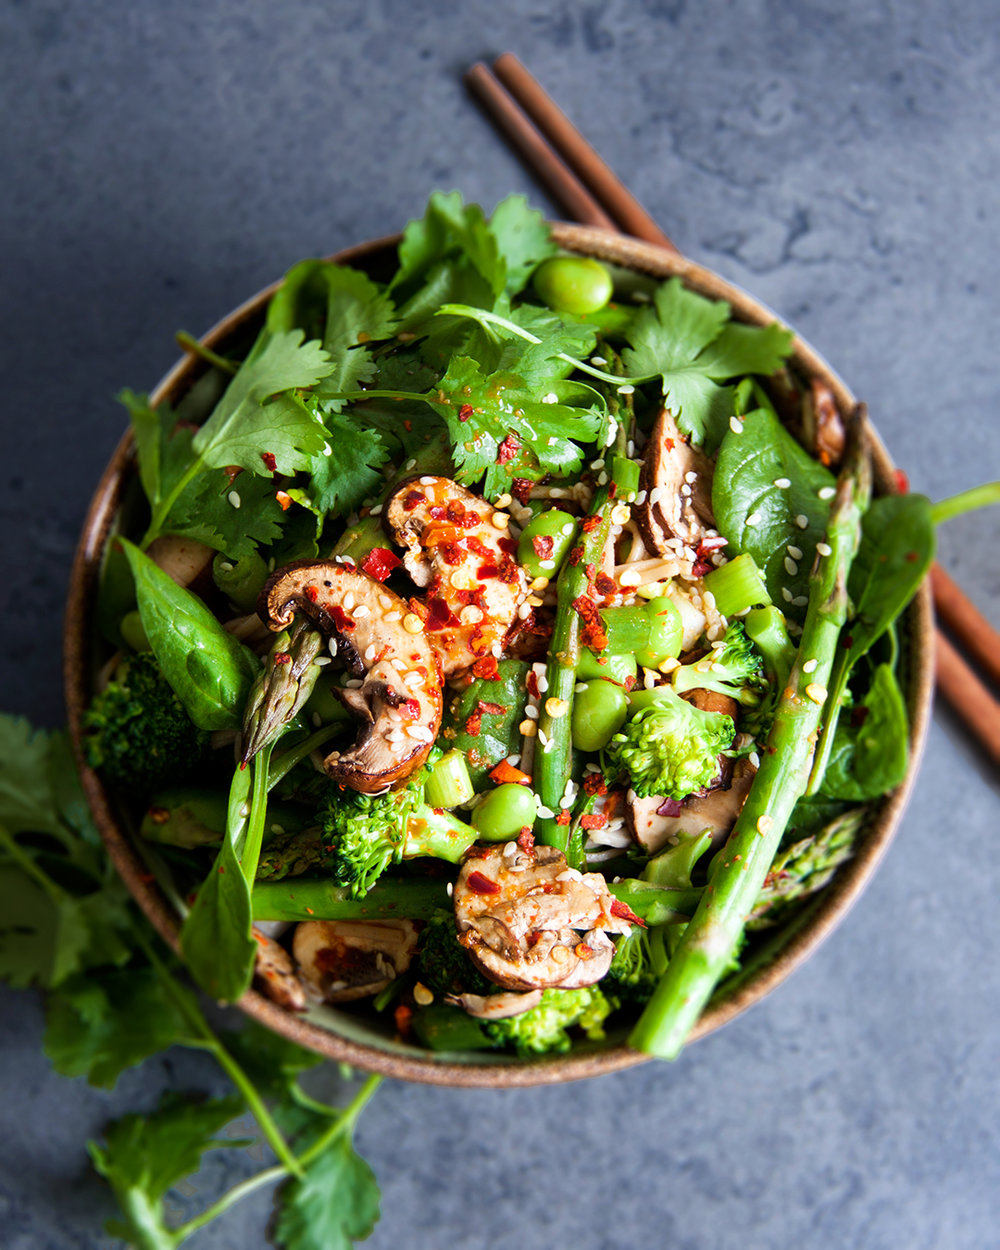 sobanoedels-lentegroenten-vegan-whole-foods-vetarm-glutenvrij-02.jpg